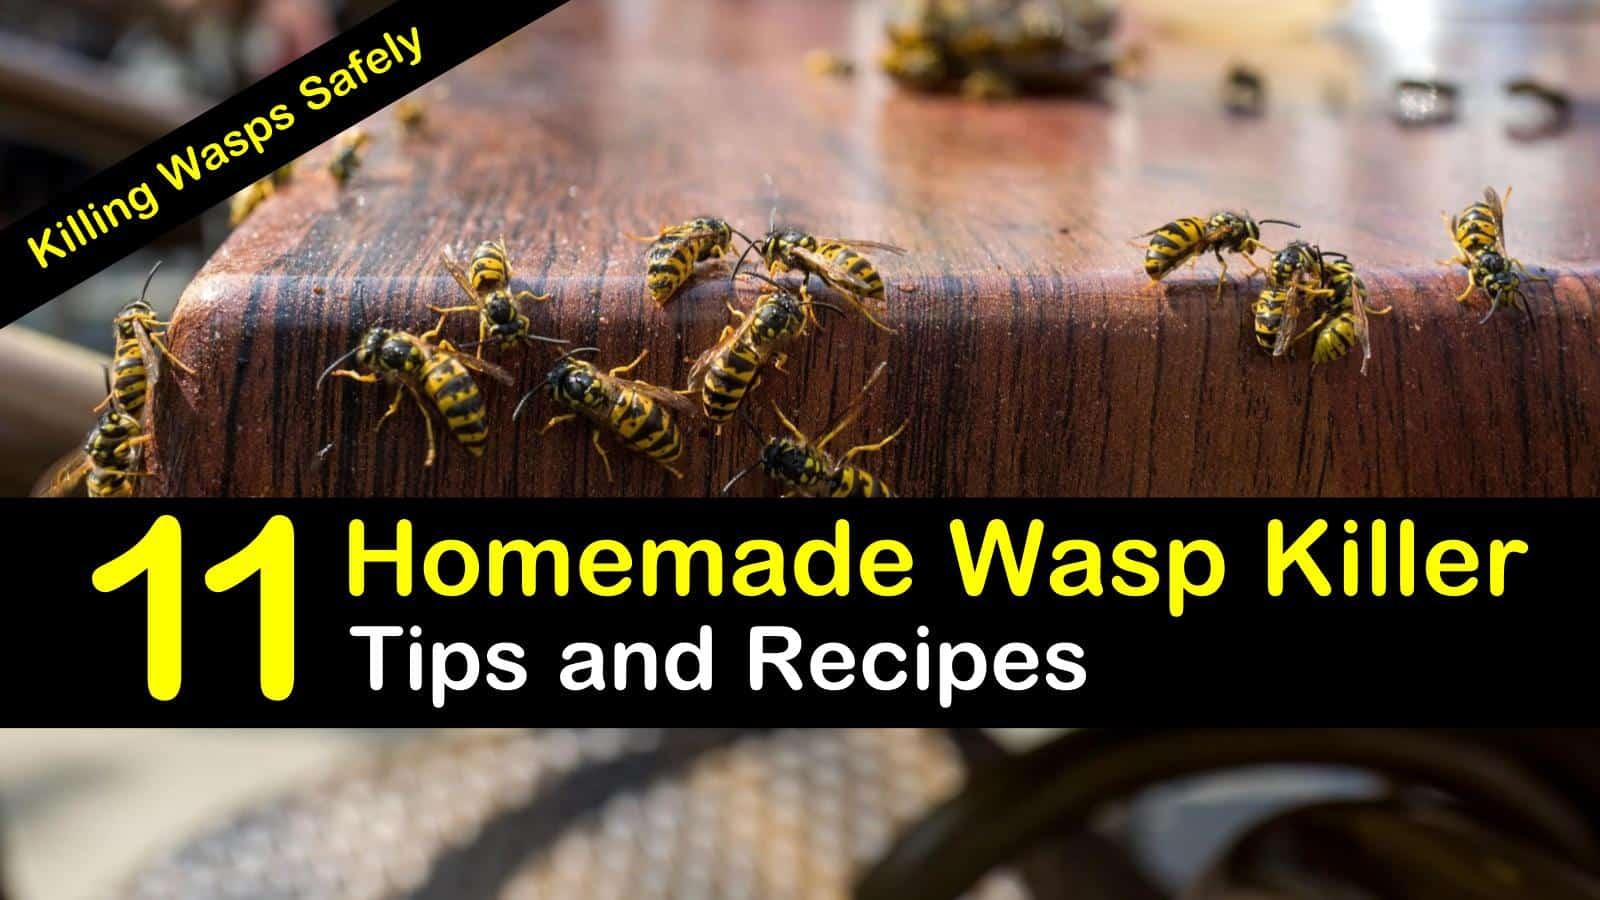 Killing Wasps Safely - 11 Homemade Wasp